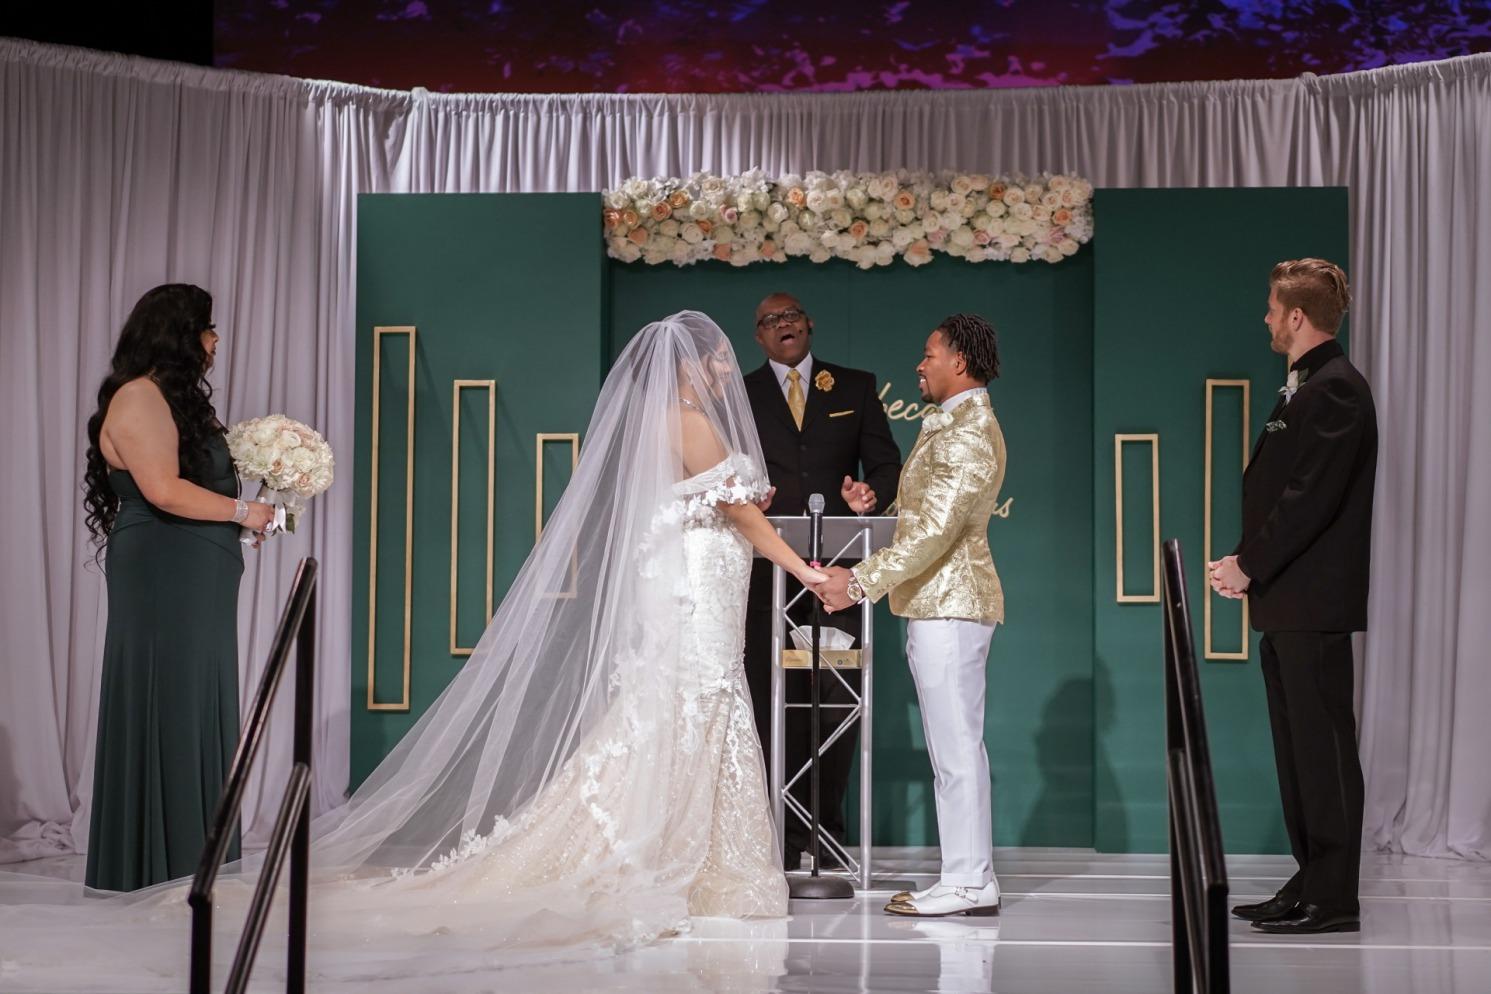 Emerald and Gold Las Vegas Wedding